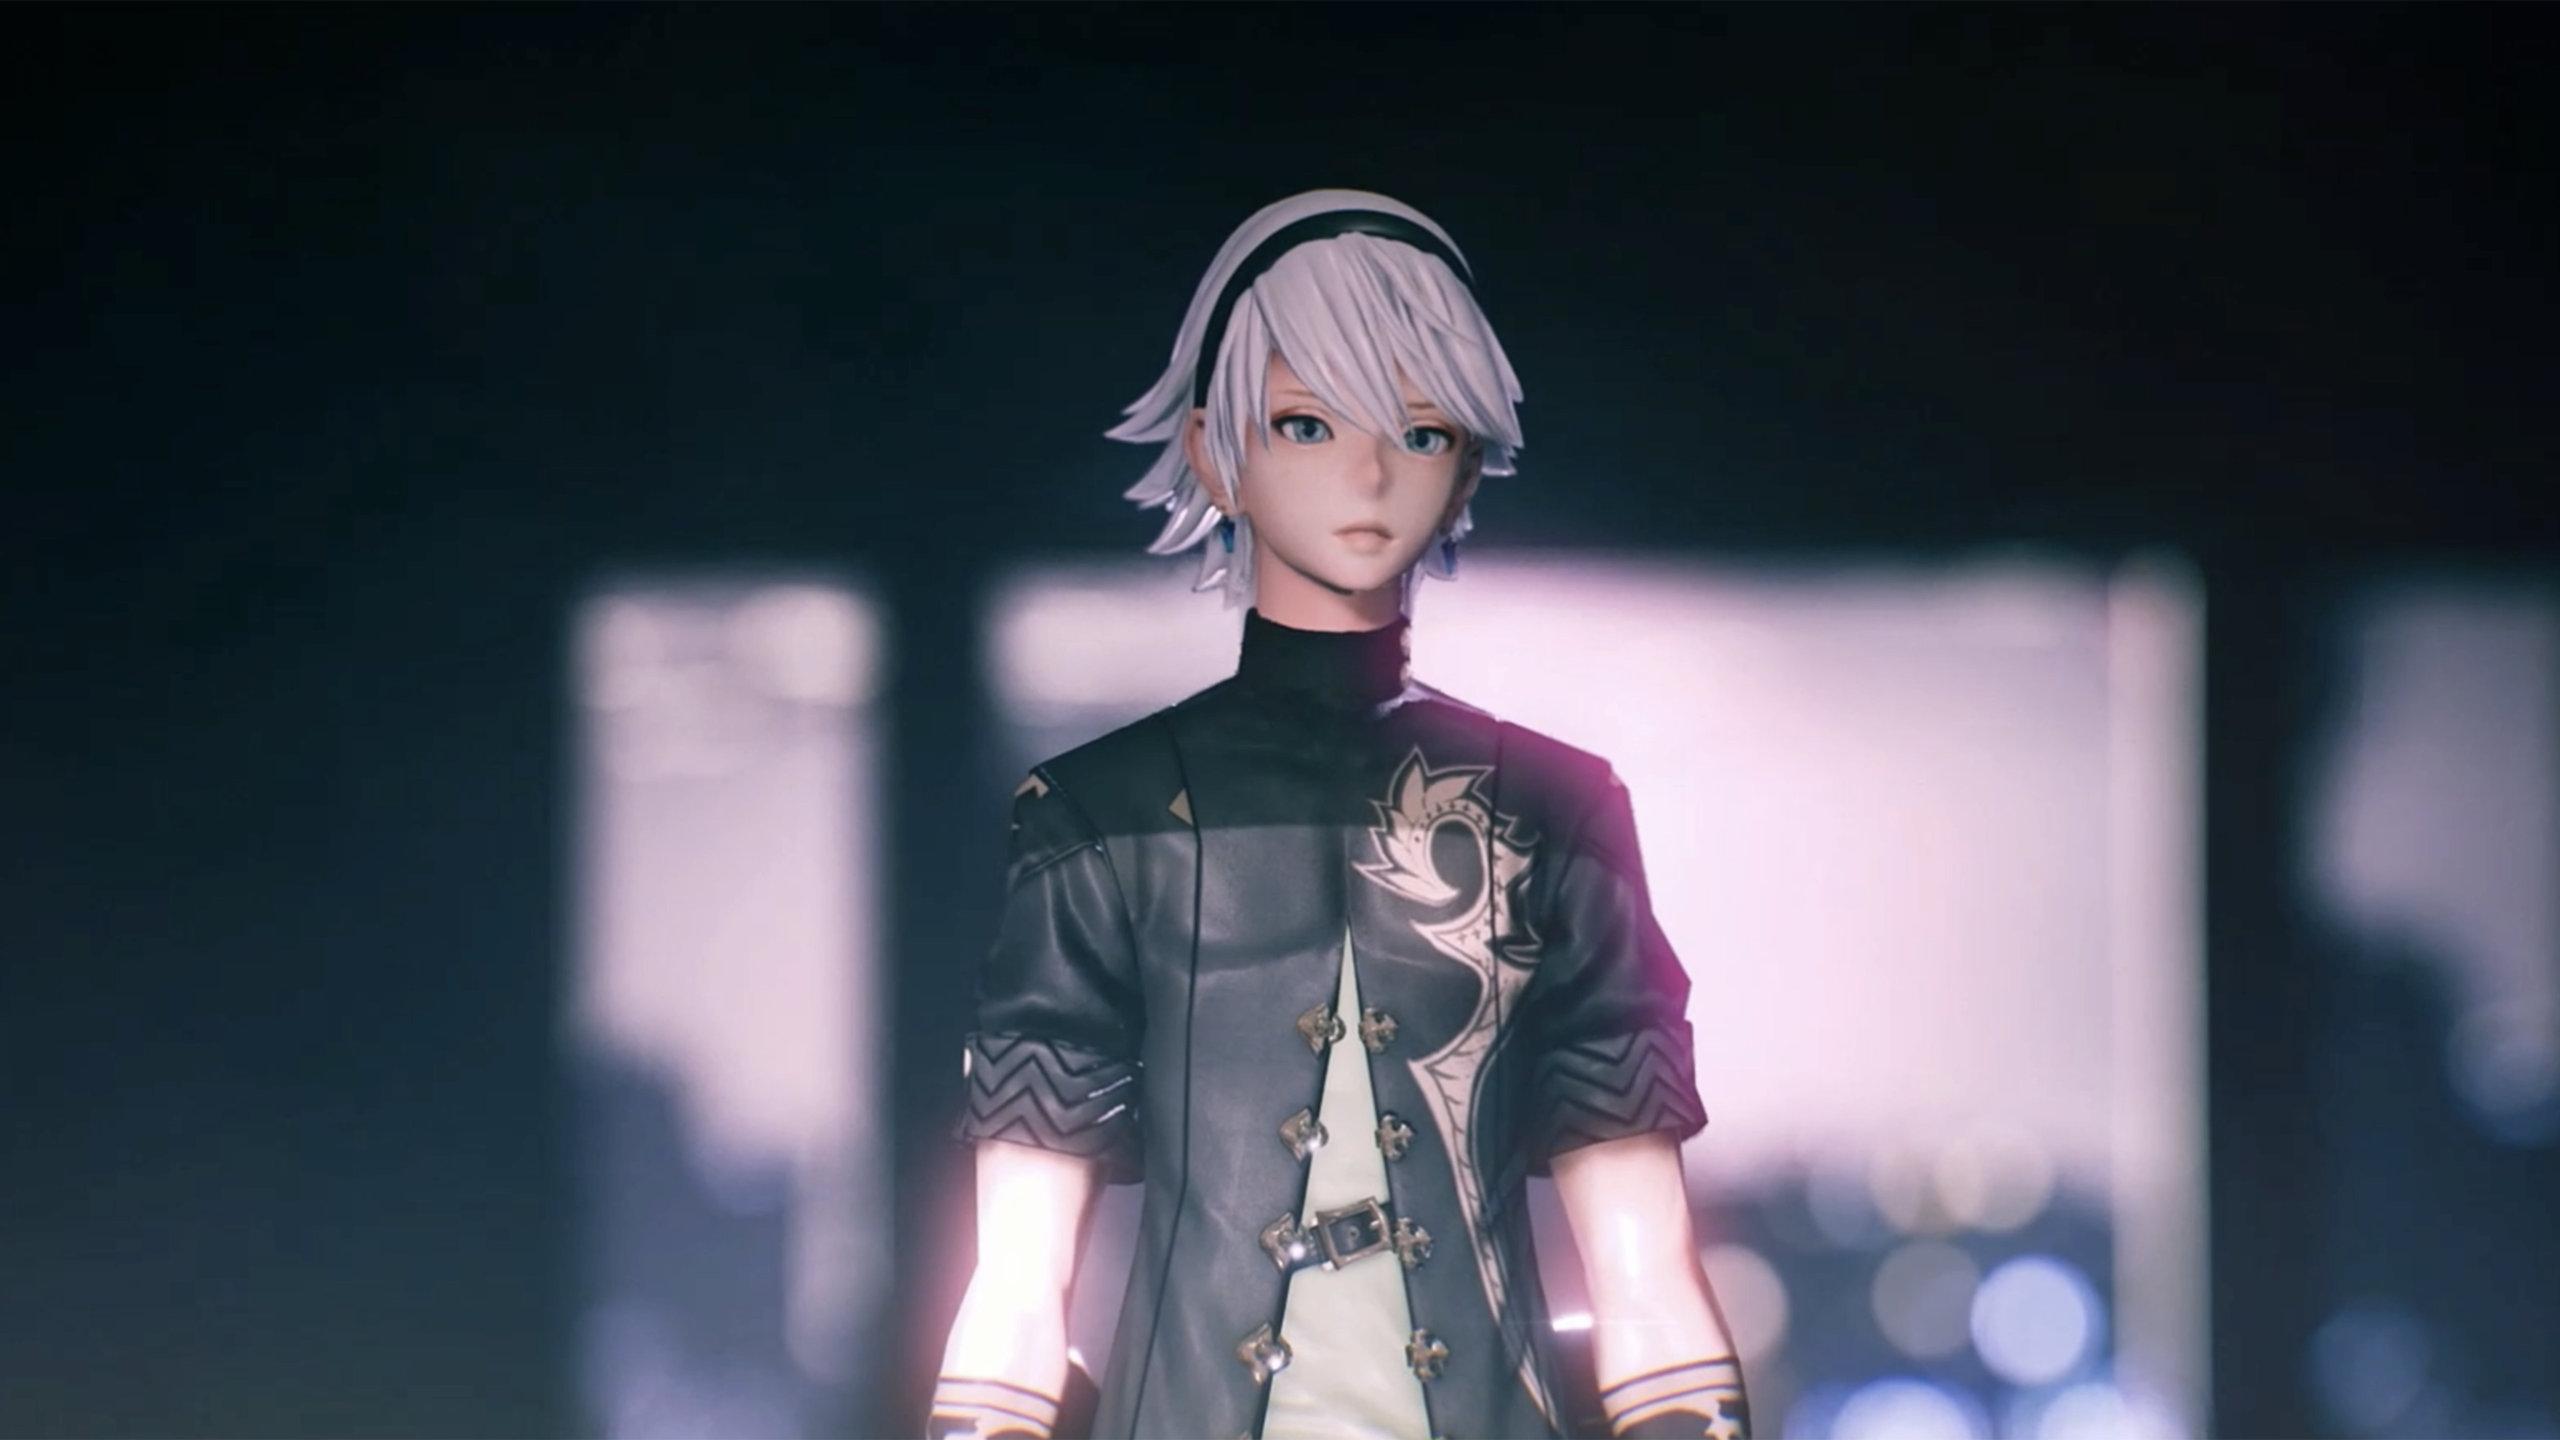 Fantasian Screenshot of the main protagonist, Leo